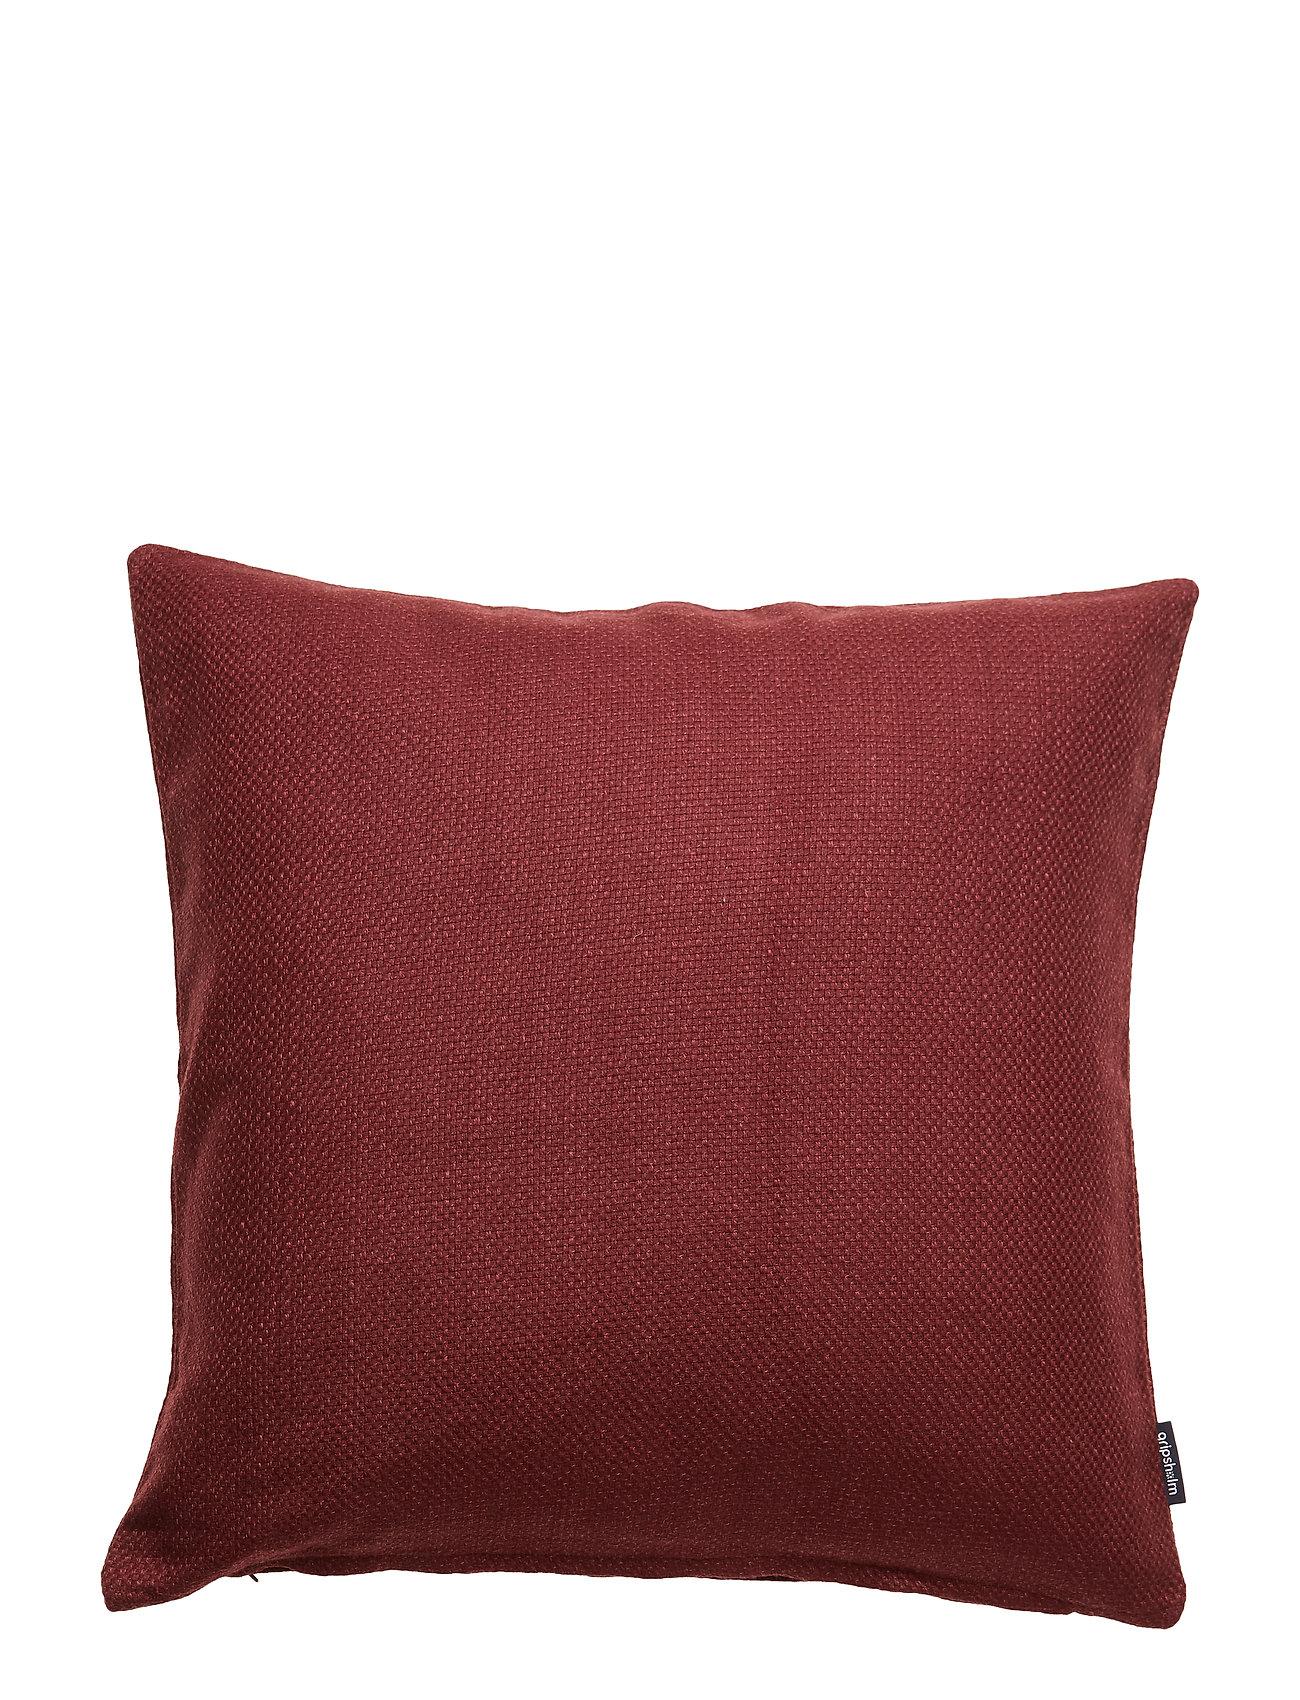 Cushion Dalia GotswineGripsholm Cover Cover Cushion Cushion GotswineGripsholm Dalia Cover BderxoWC